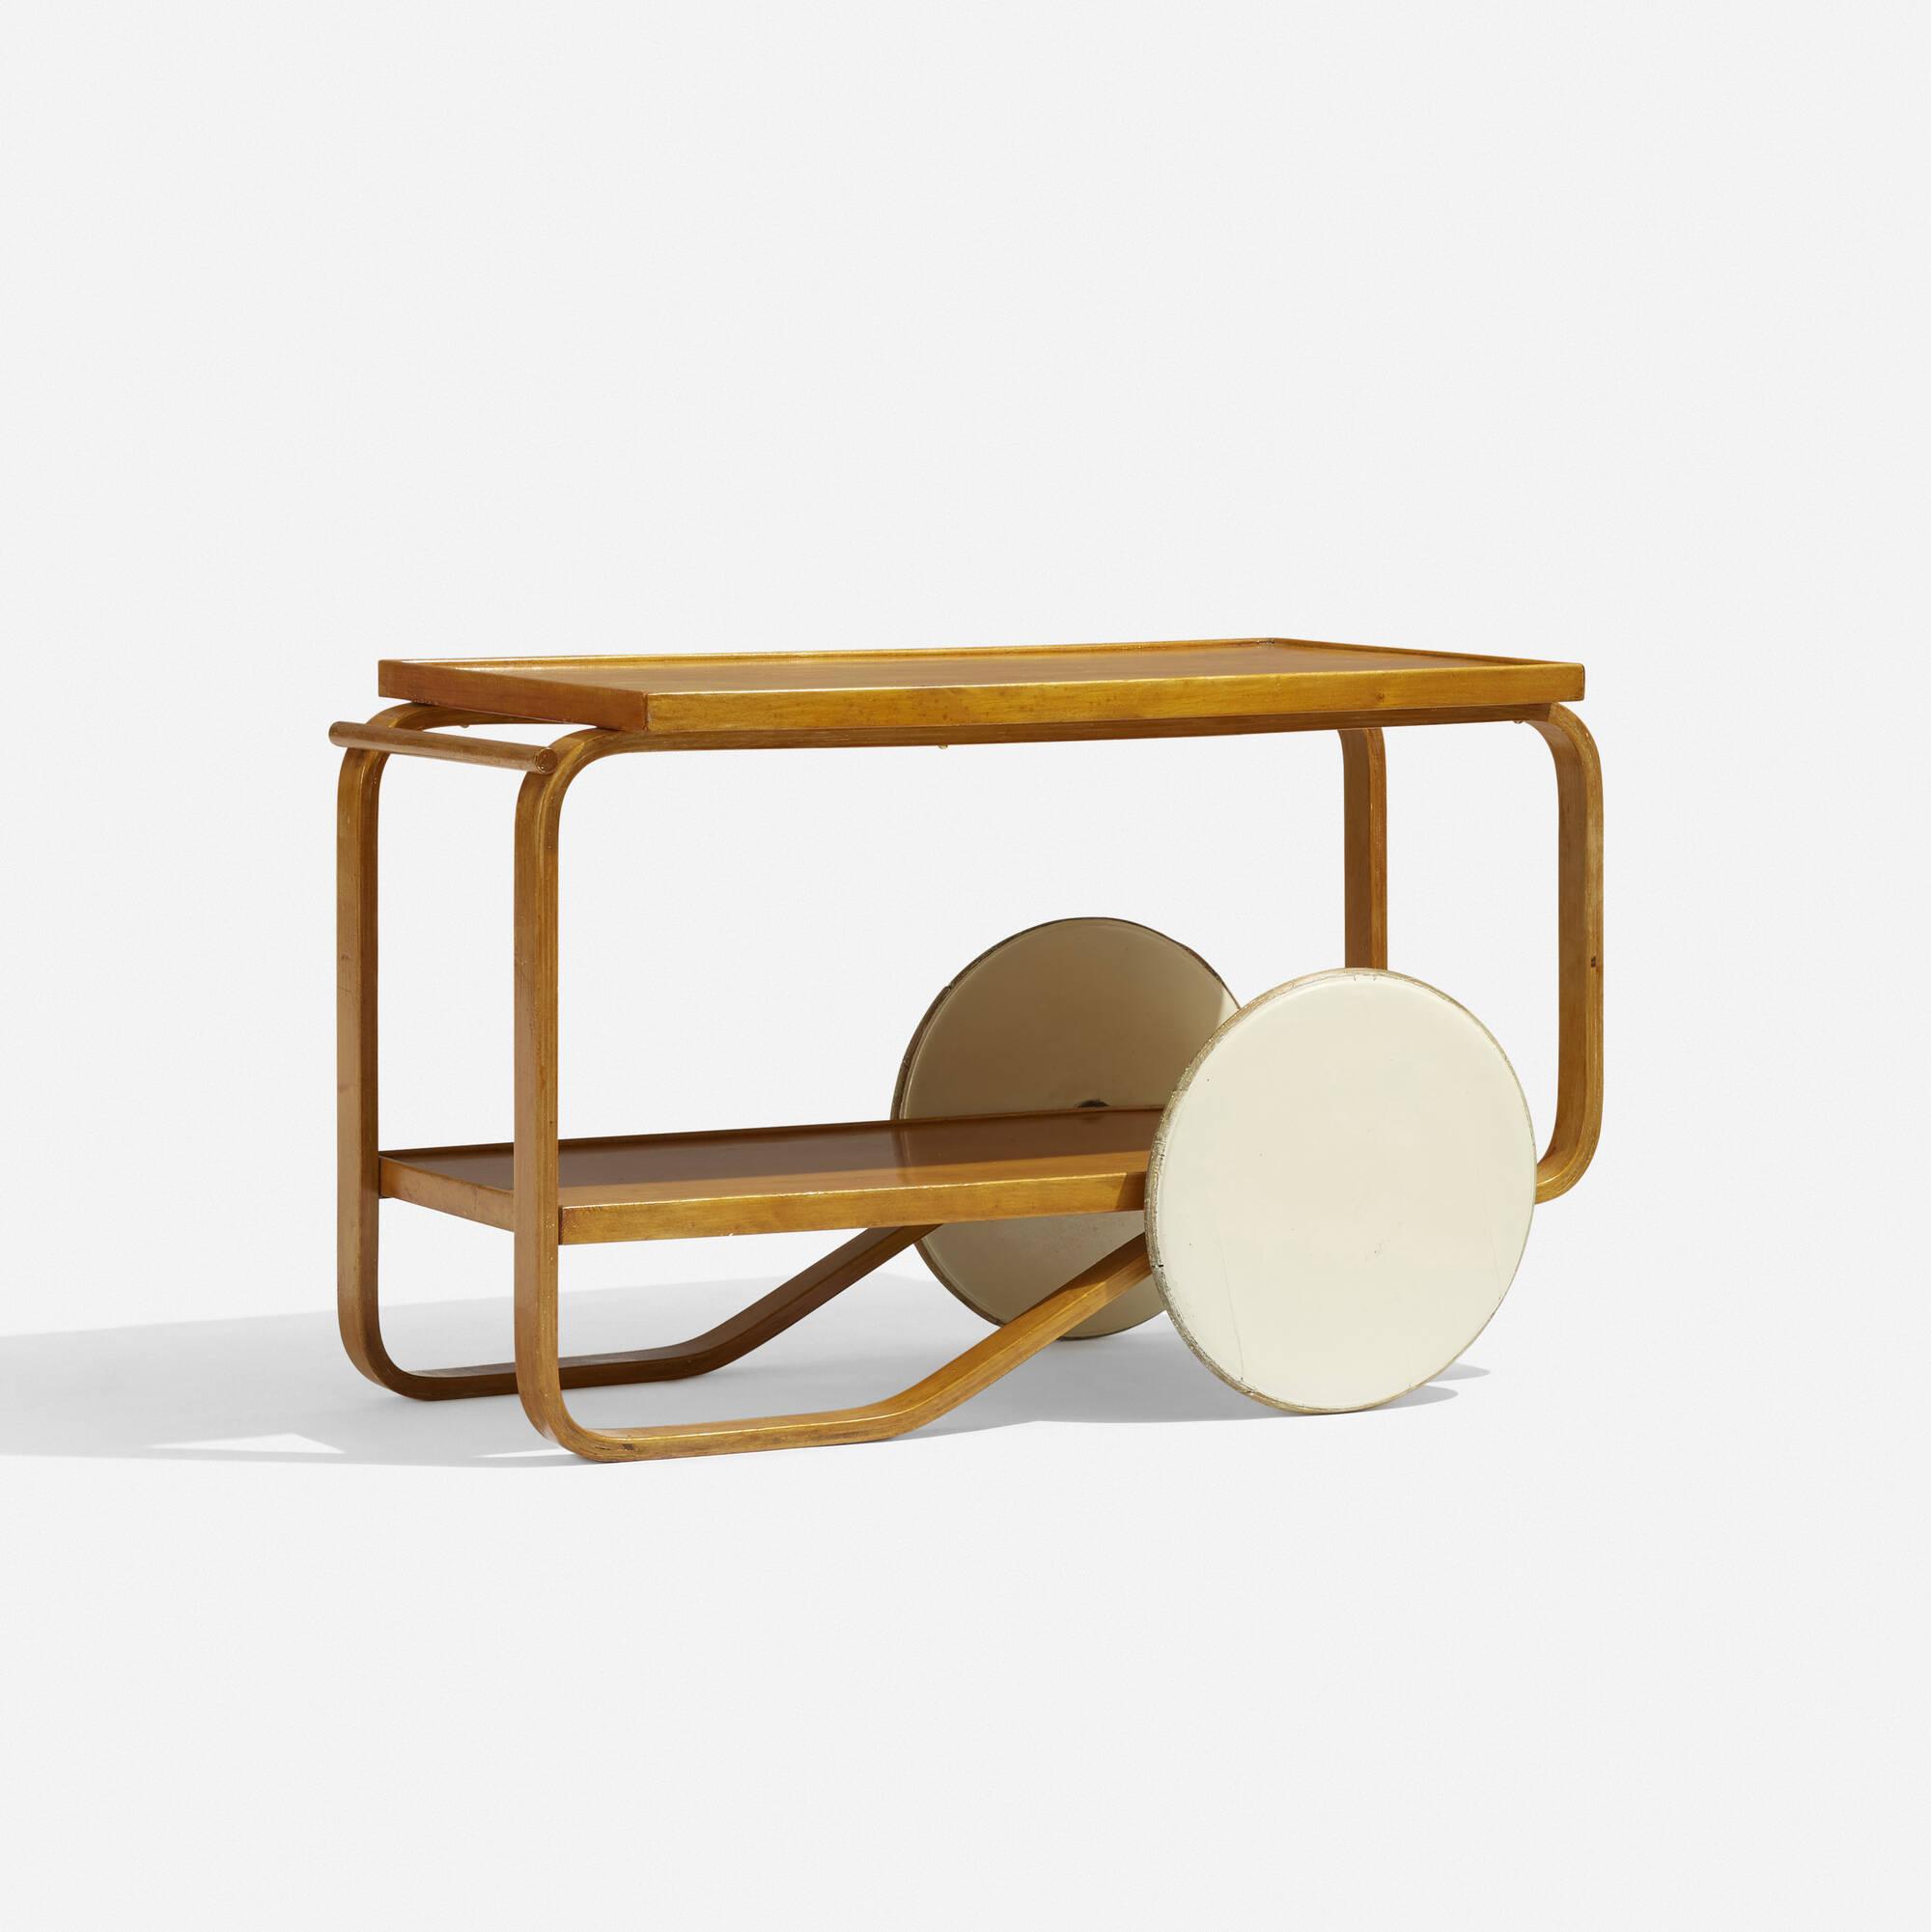 156: Alvar Aalto / tea trolley (2 of 3)